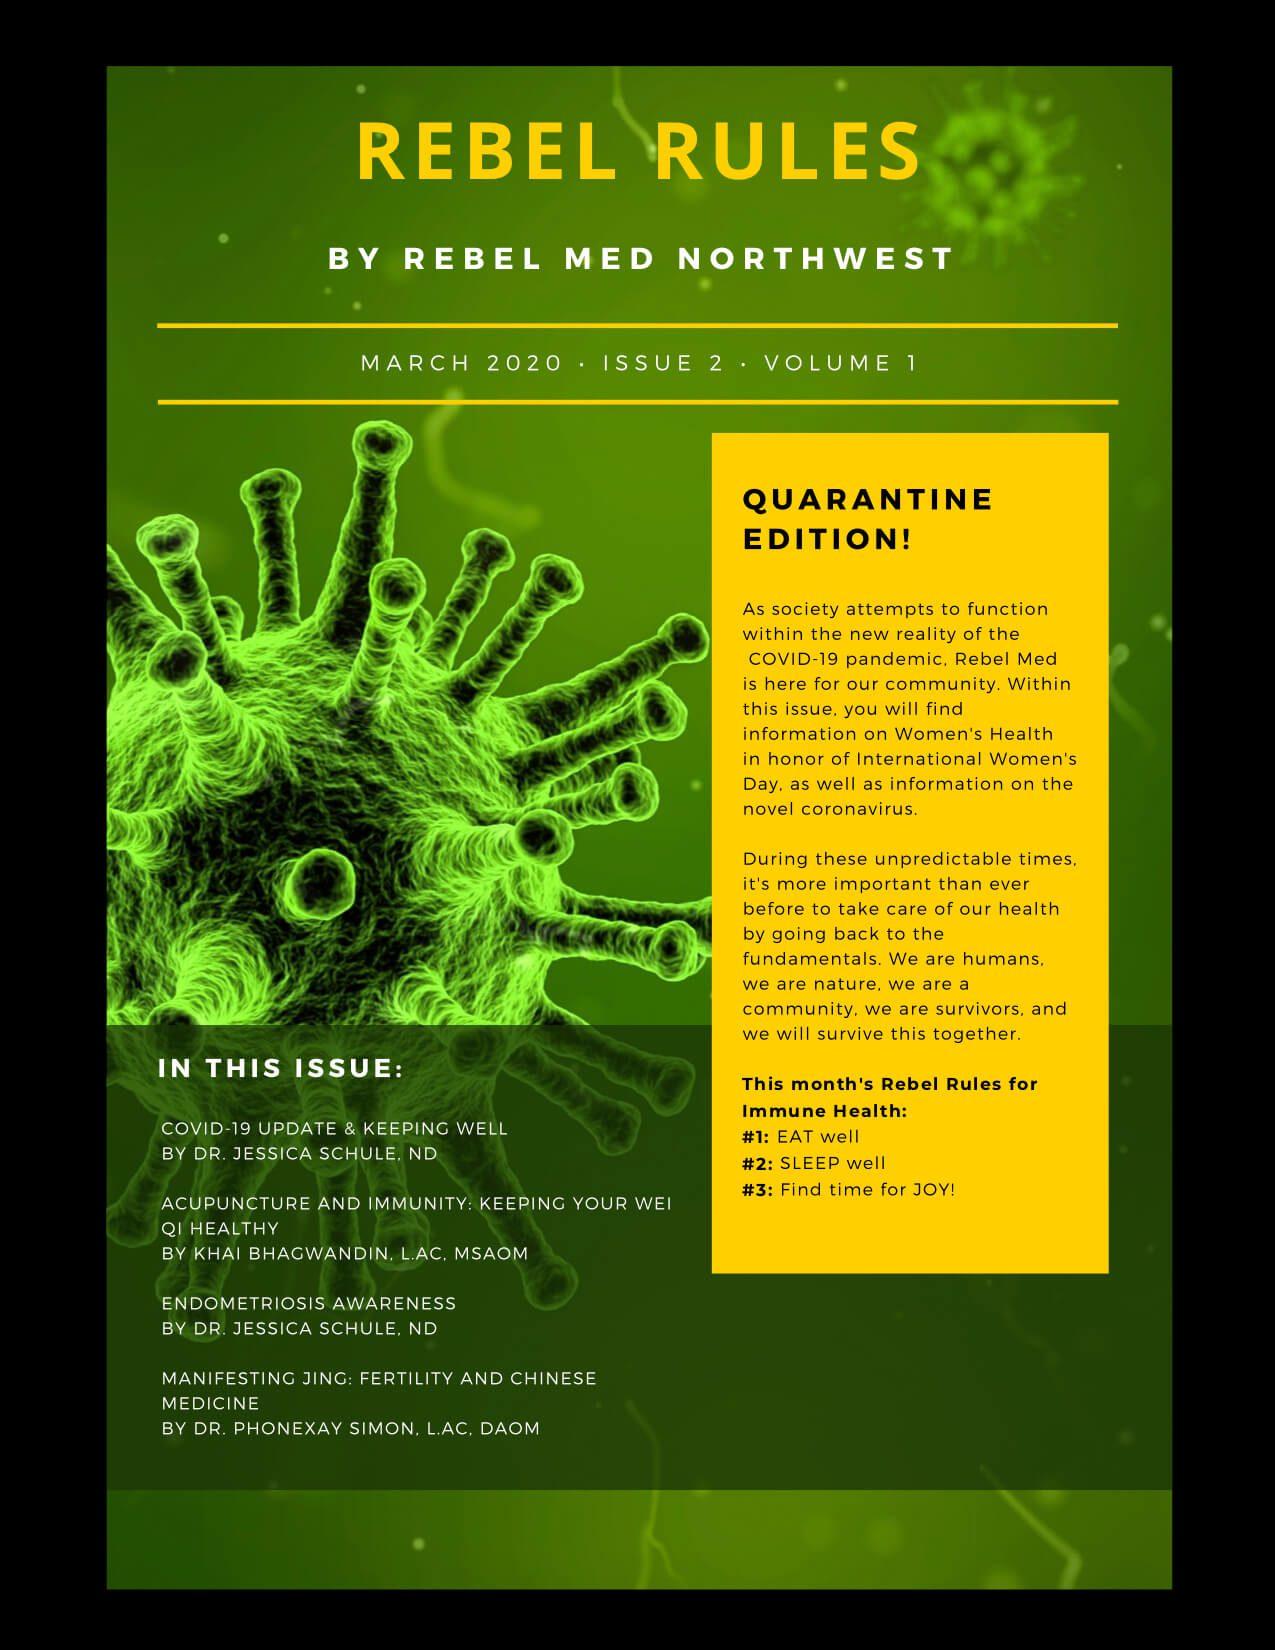 Coronavirus: quarantine edition